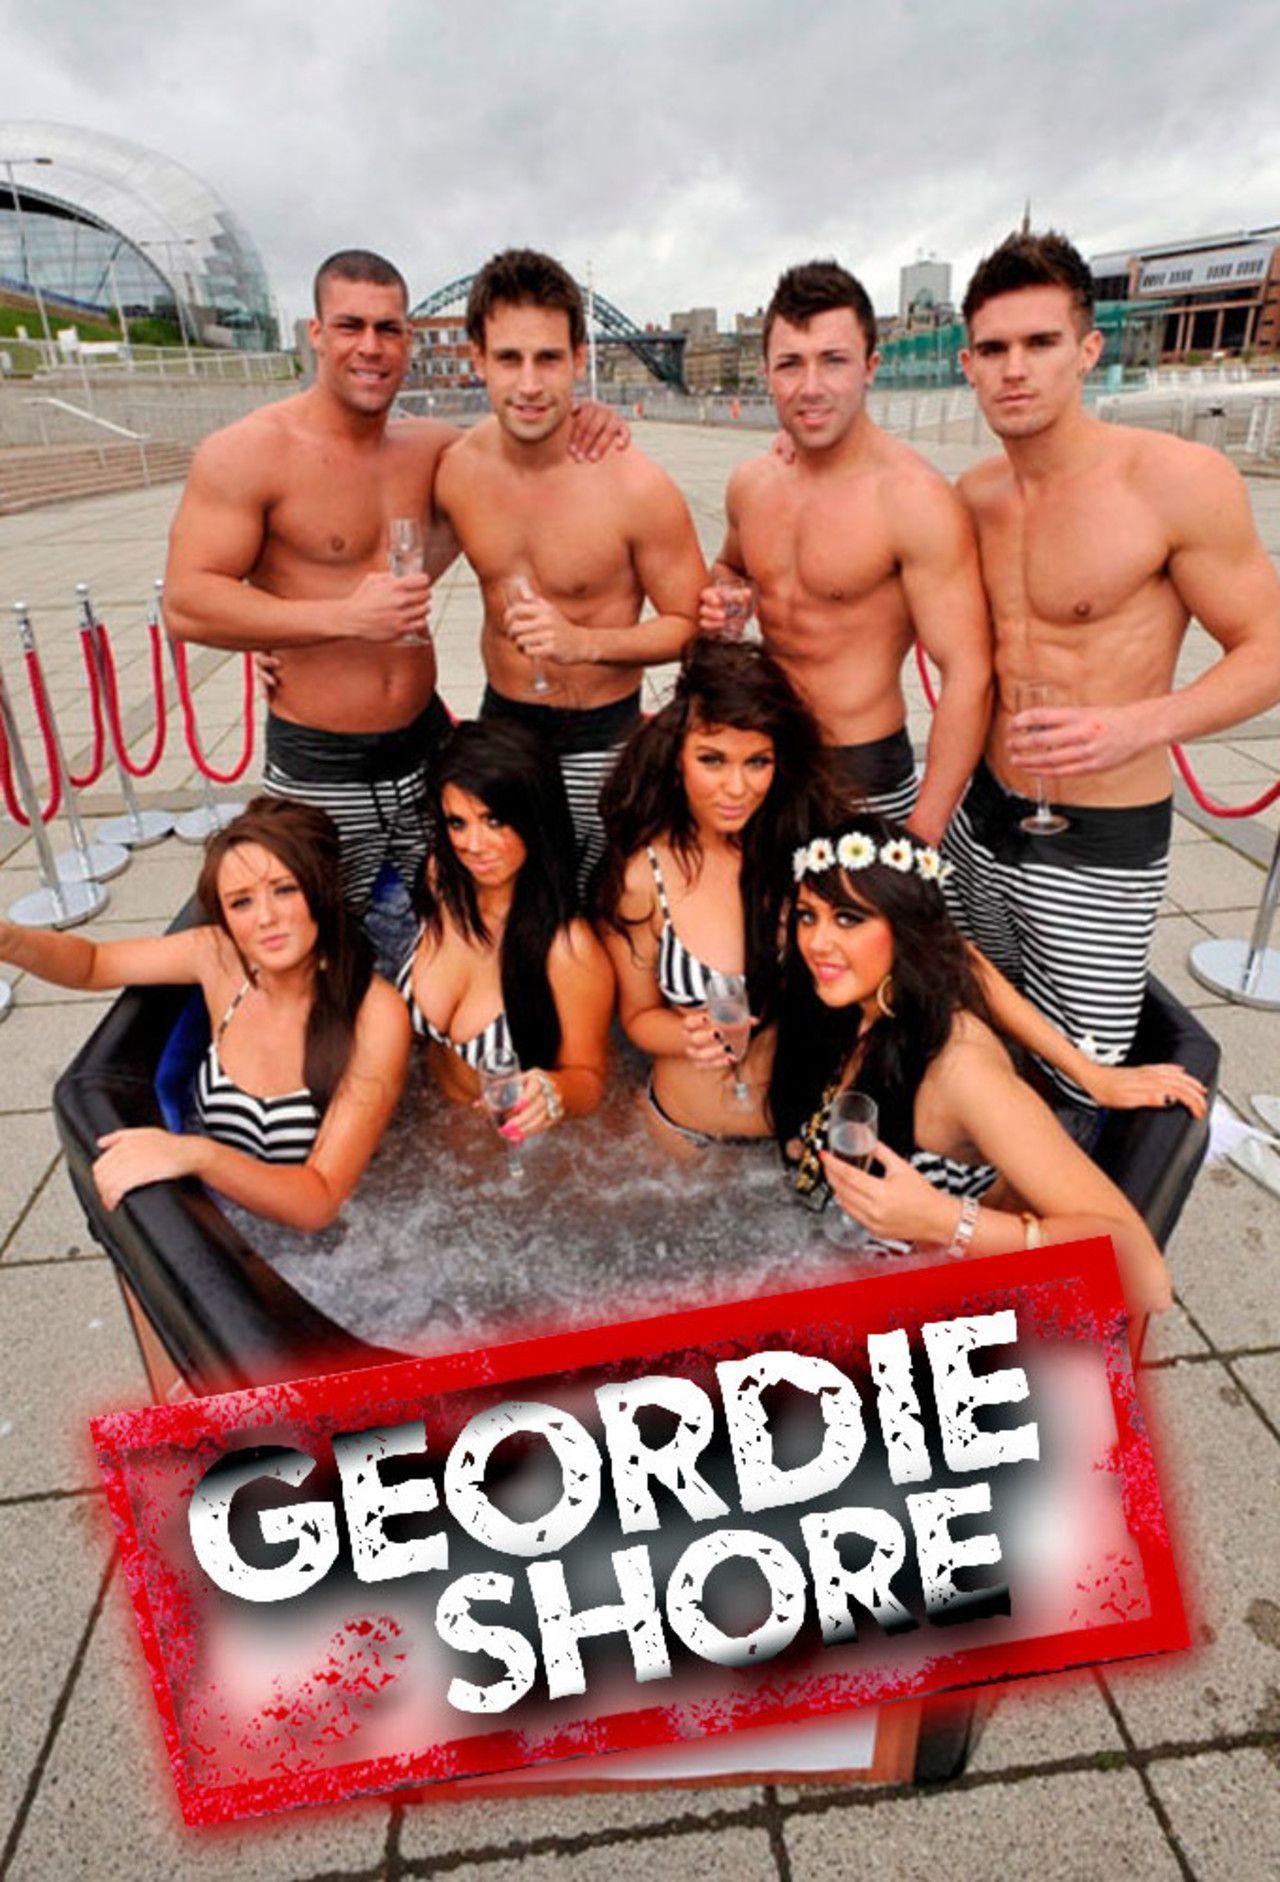 Geordie Shore Season 13 Episode 1 Https Www Tvseriesonline Tv Geordie Shore Season 13 Episode 1 Geordie Shore Tv Series To Watch Tv Shows Online